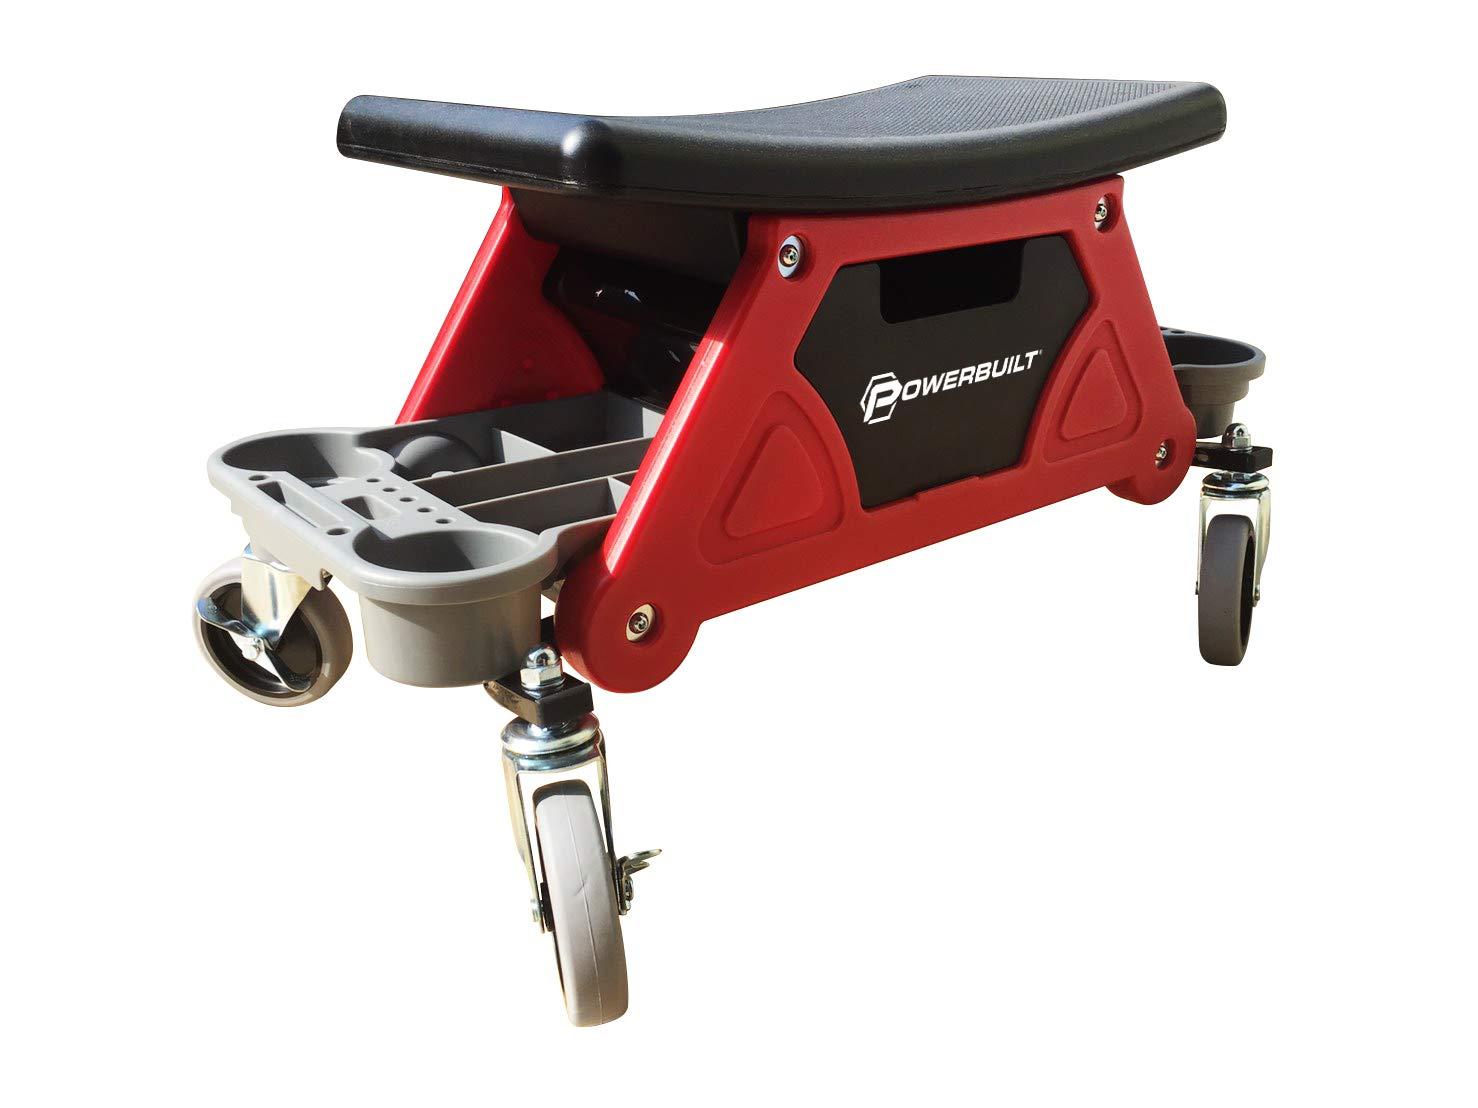 Powerbuilt Heavy Duty Rolling Mechanics Seat Brake Stool 300lb Capacity - 240036 (Stool) by Powerbuilt (Image #7)